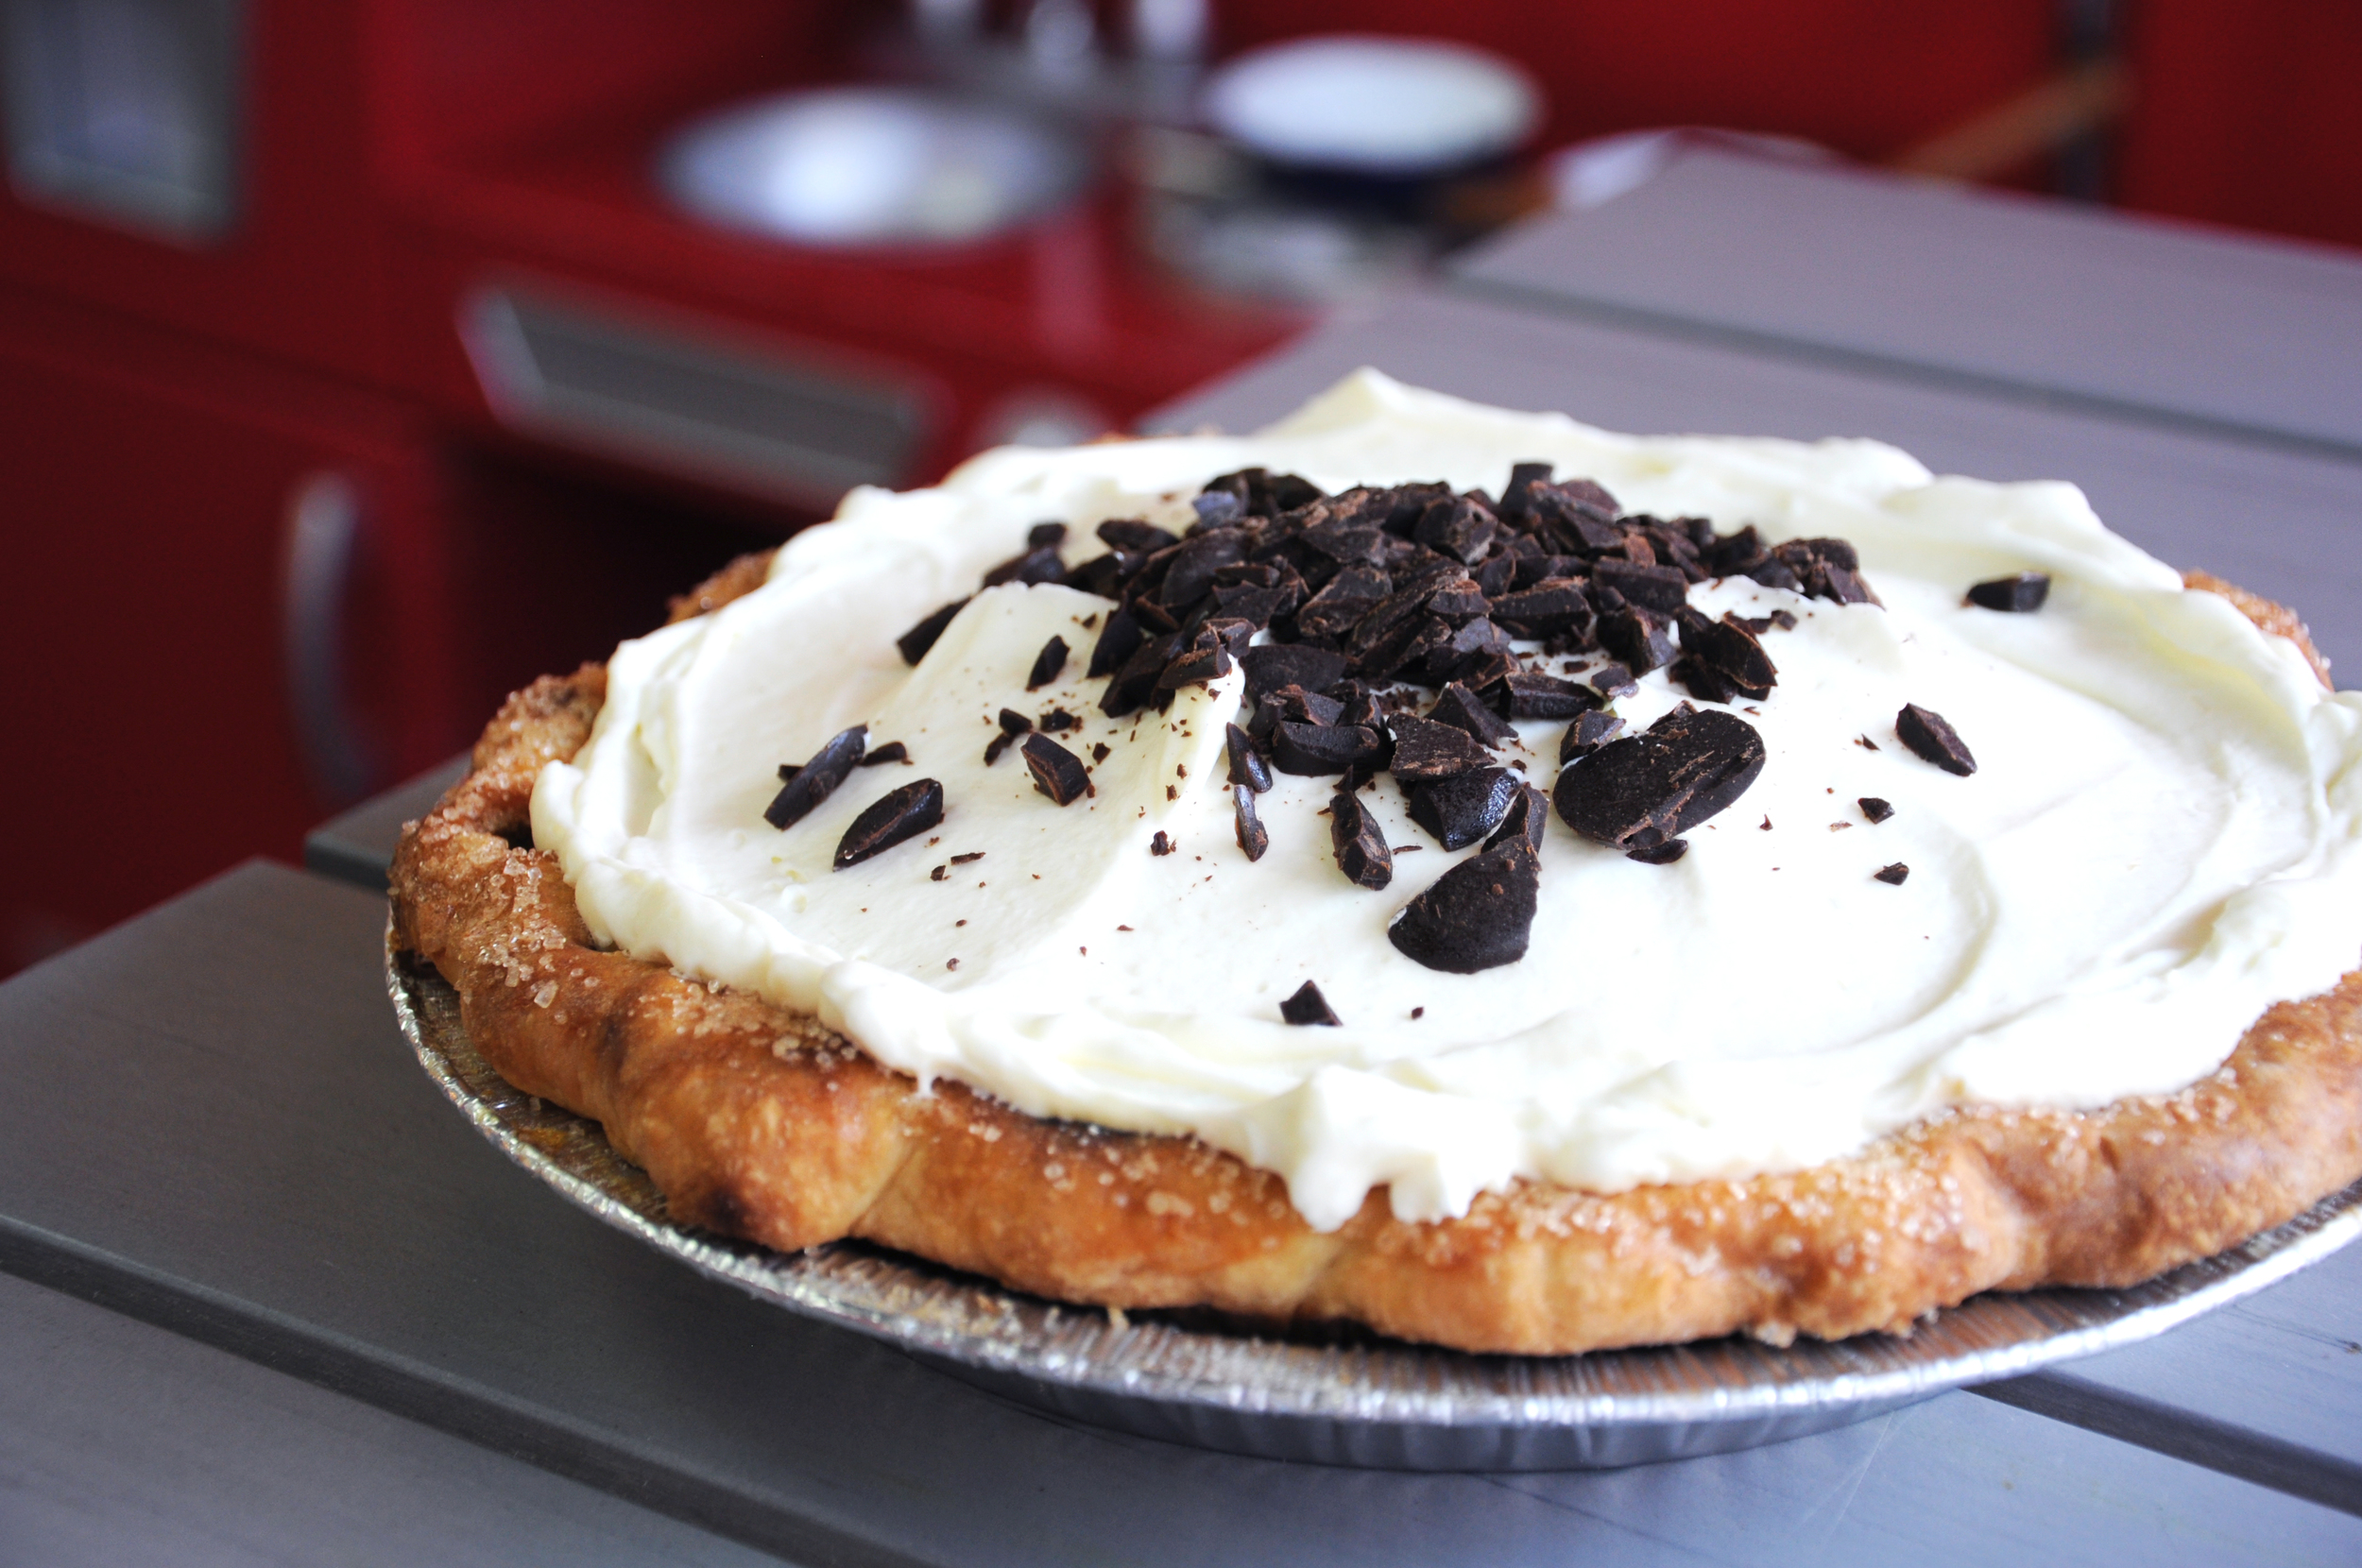 Chocolate cream pie at Robicelli's